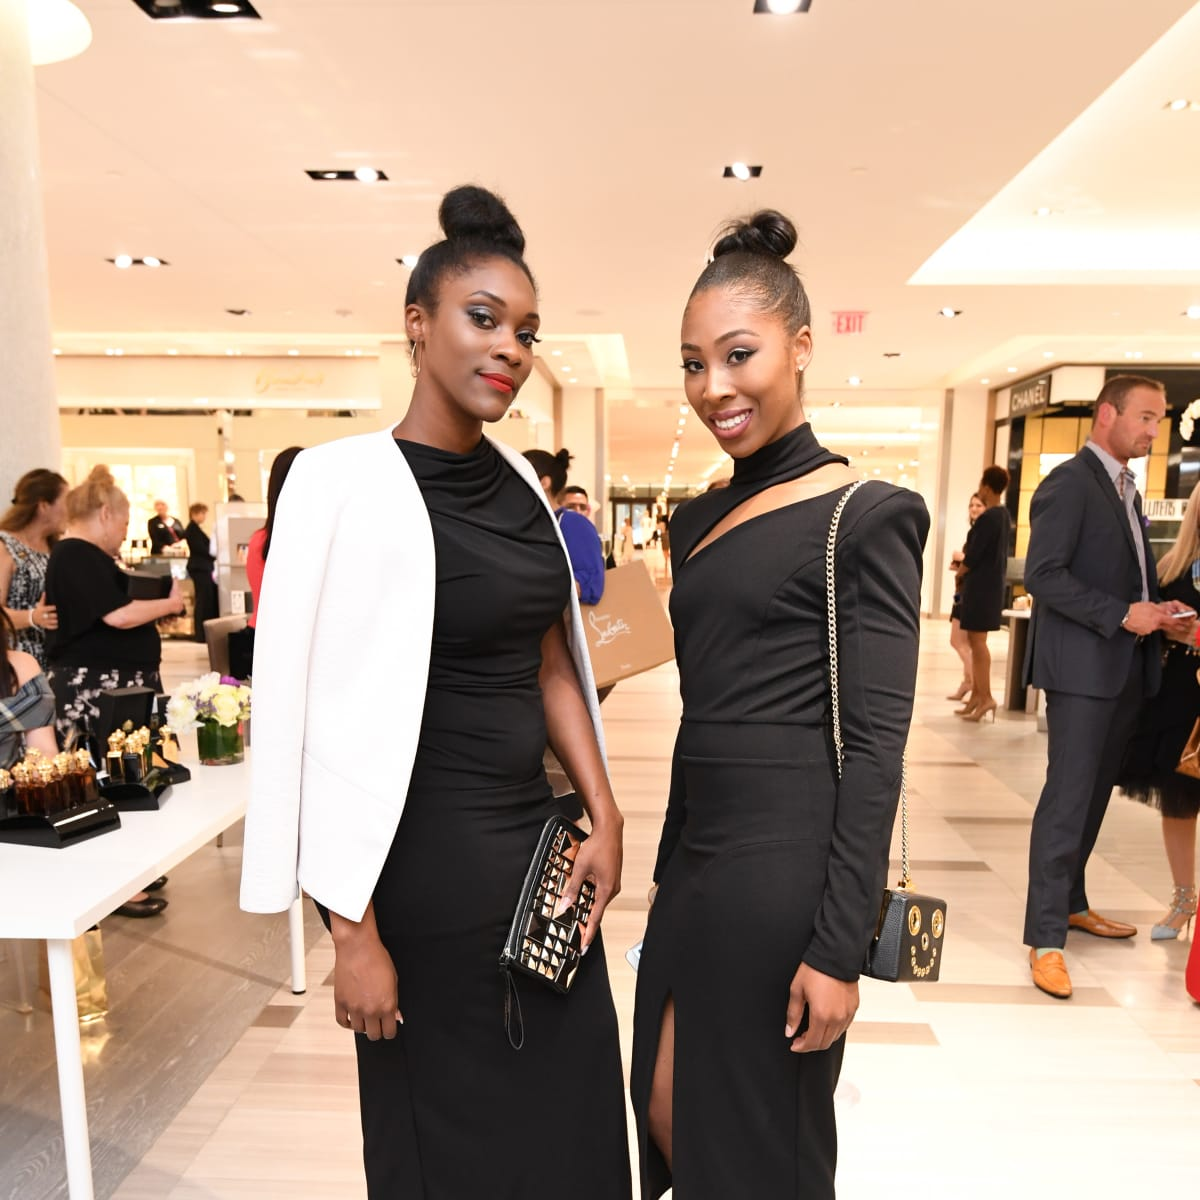 Heart of Fashion, Clive Christian Event, 6/16 Ashley Hendrick, Jasmine Lynch